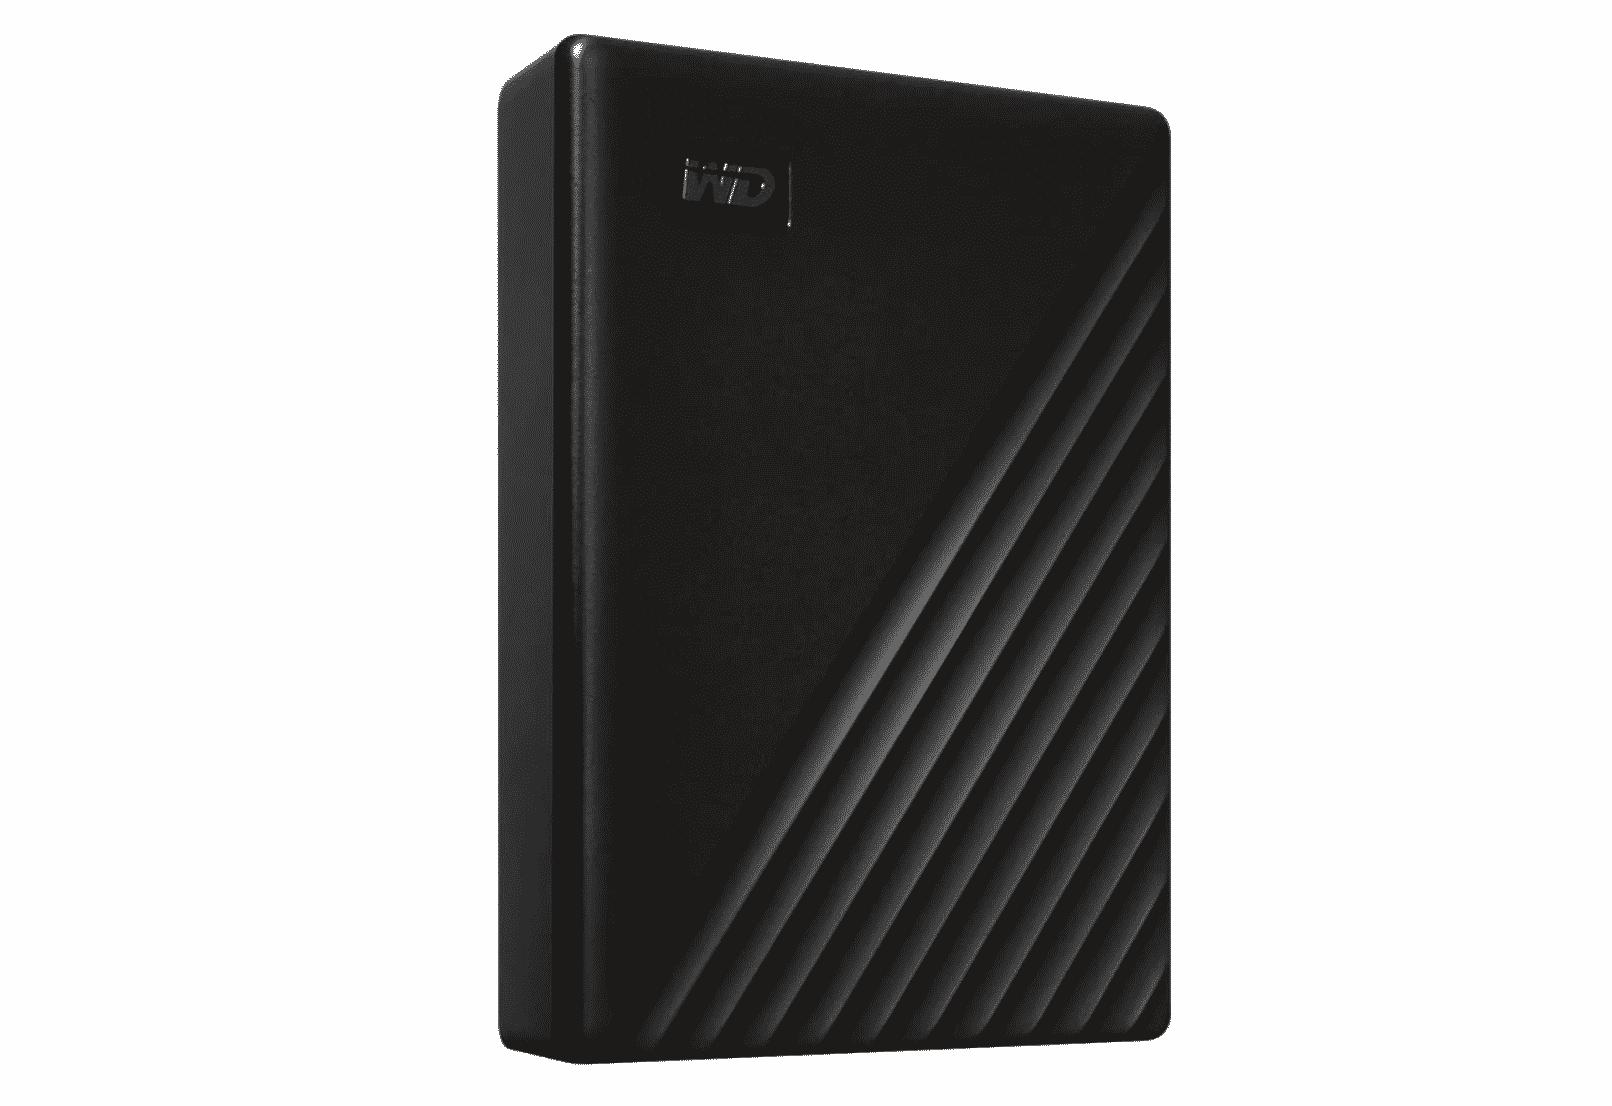 WD 5TB My Passport Portable External Hard Drive, Black